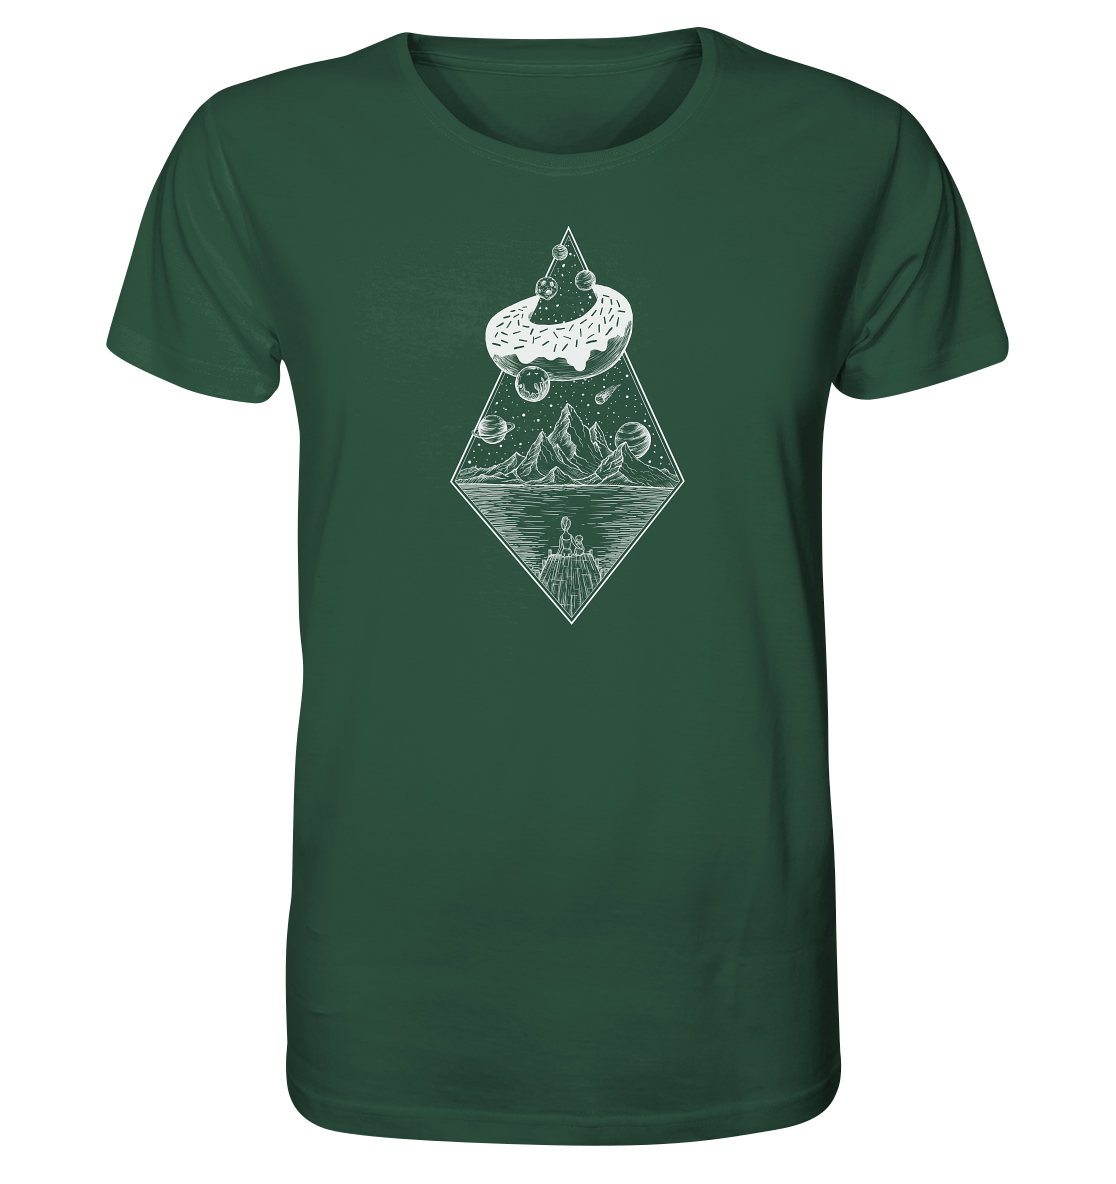 front-organic-shirt-2f5240-1116x-1.png